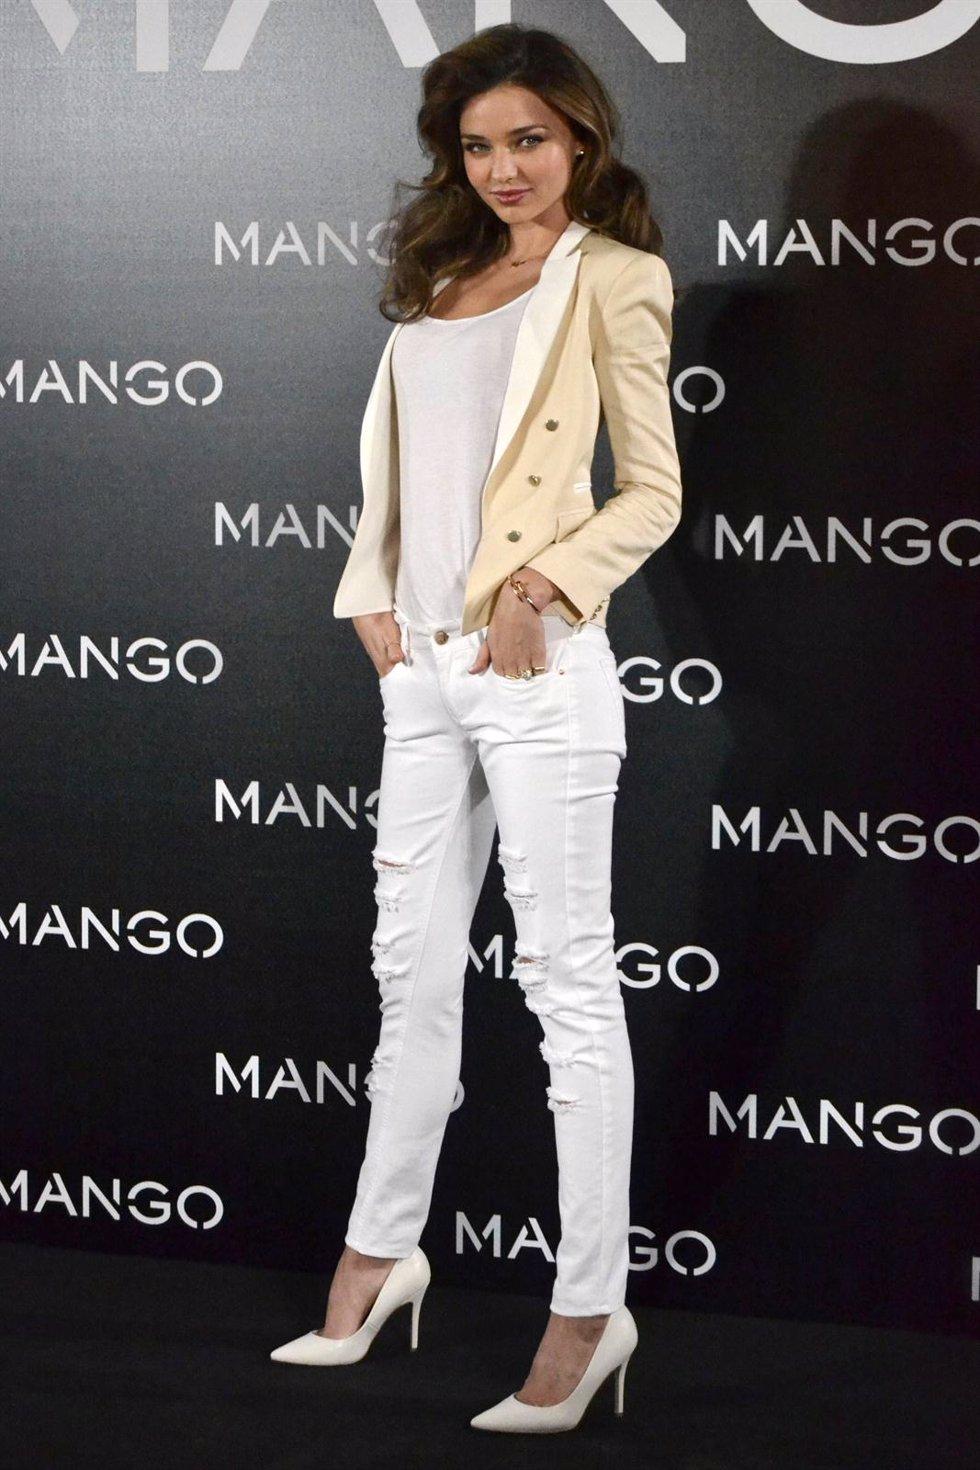 Miranda Kerr la nueva imagen de Mango